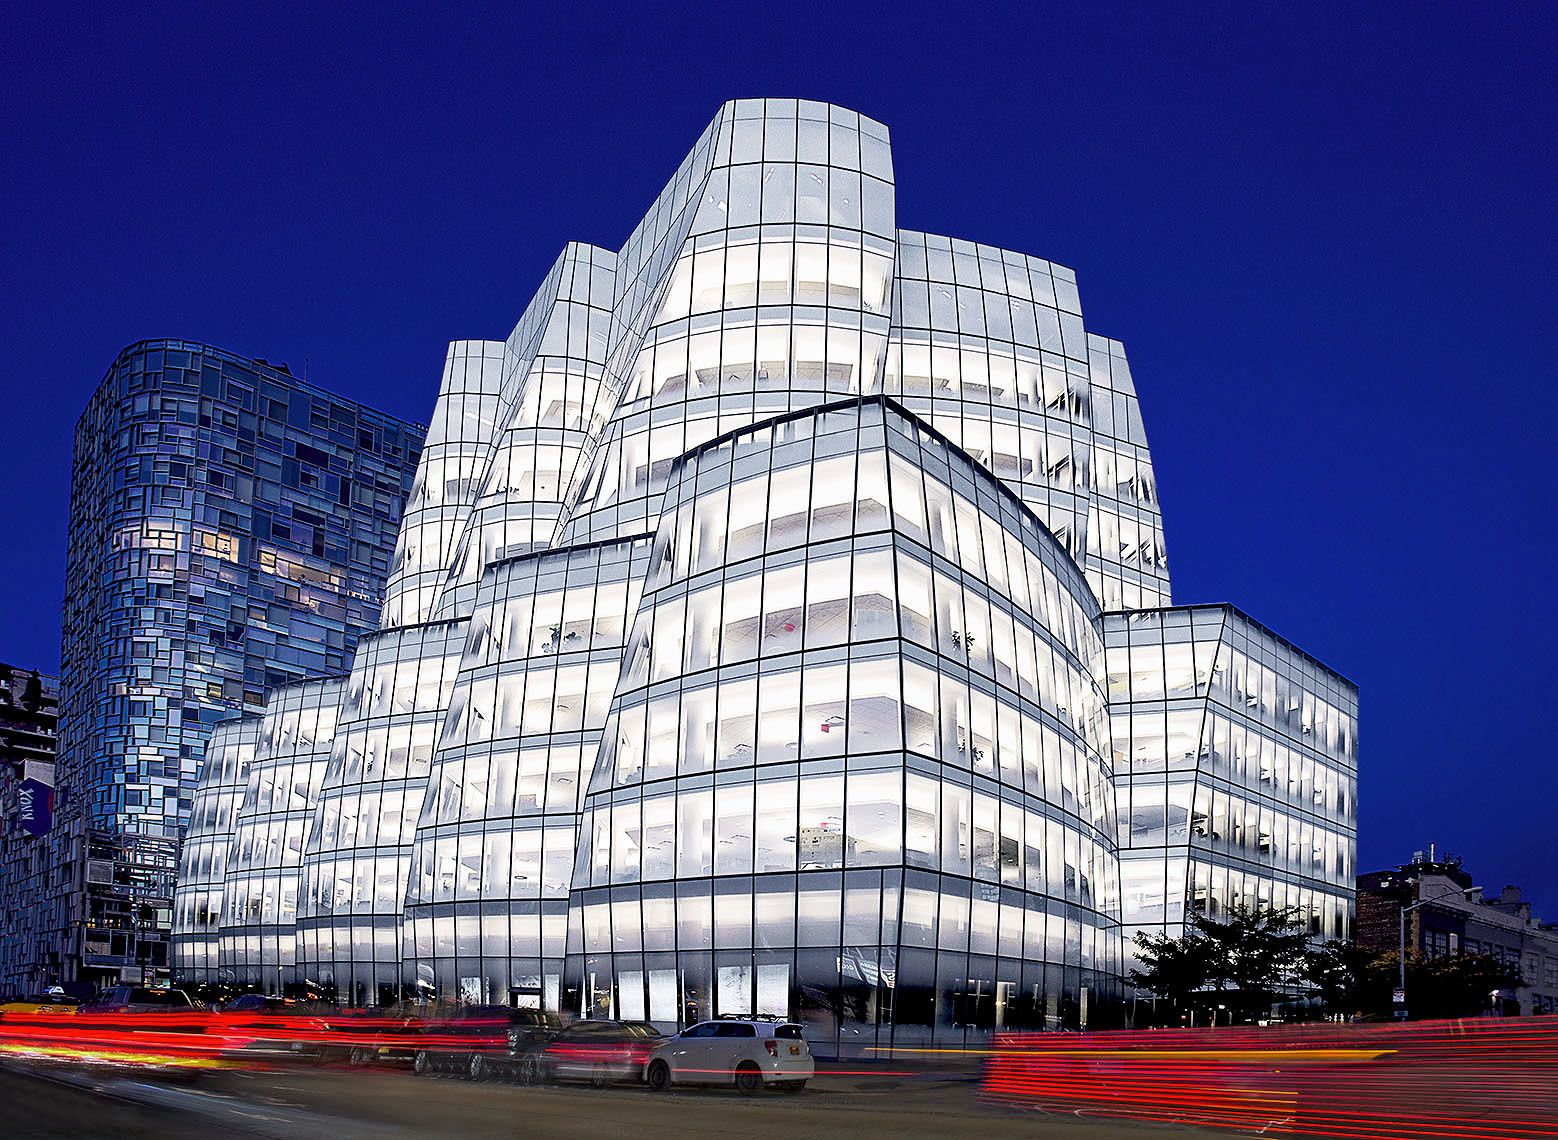 IAC Building (InterActive Corp.)